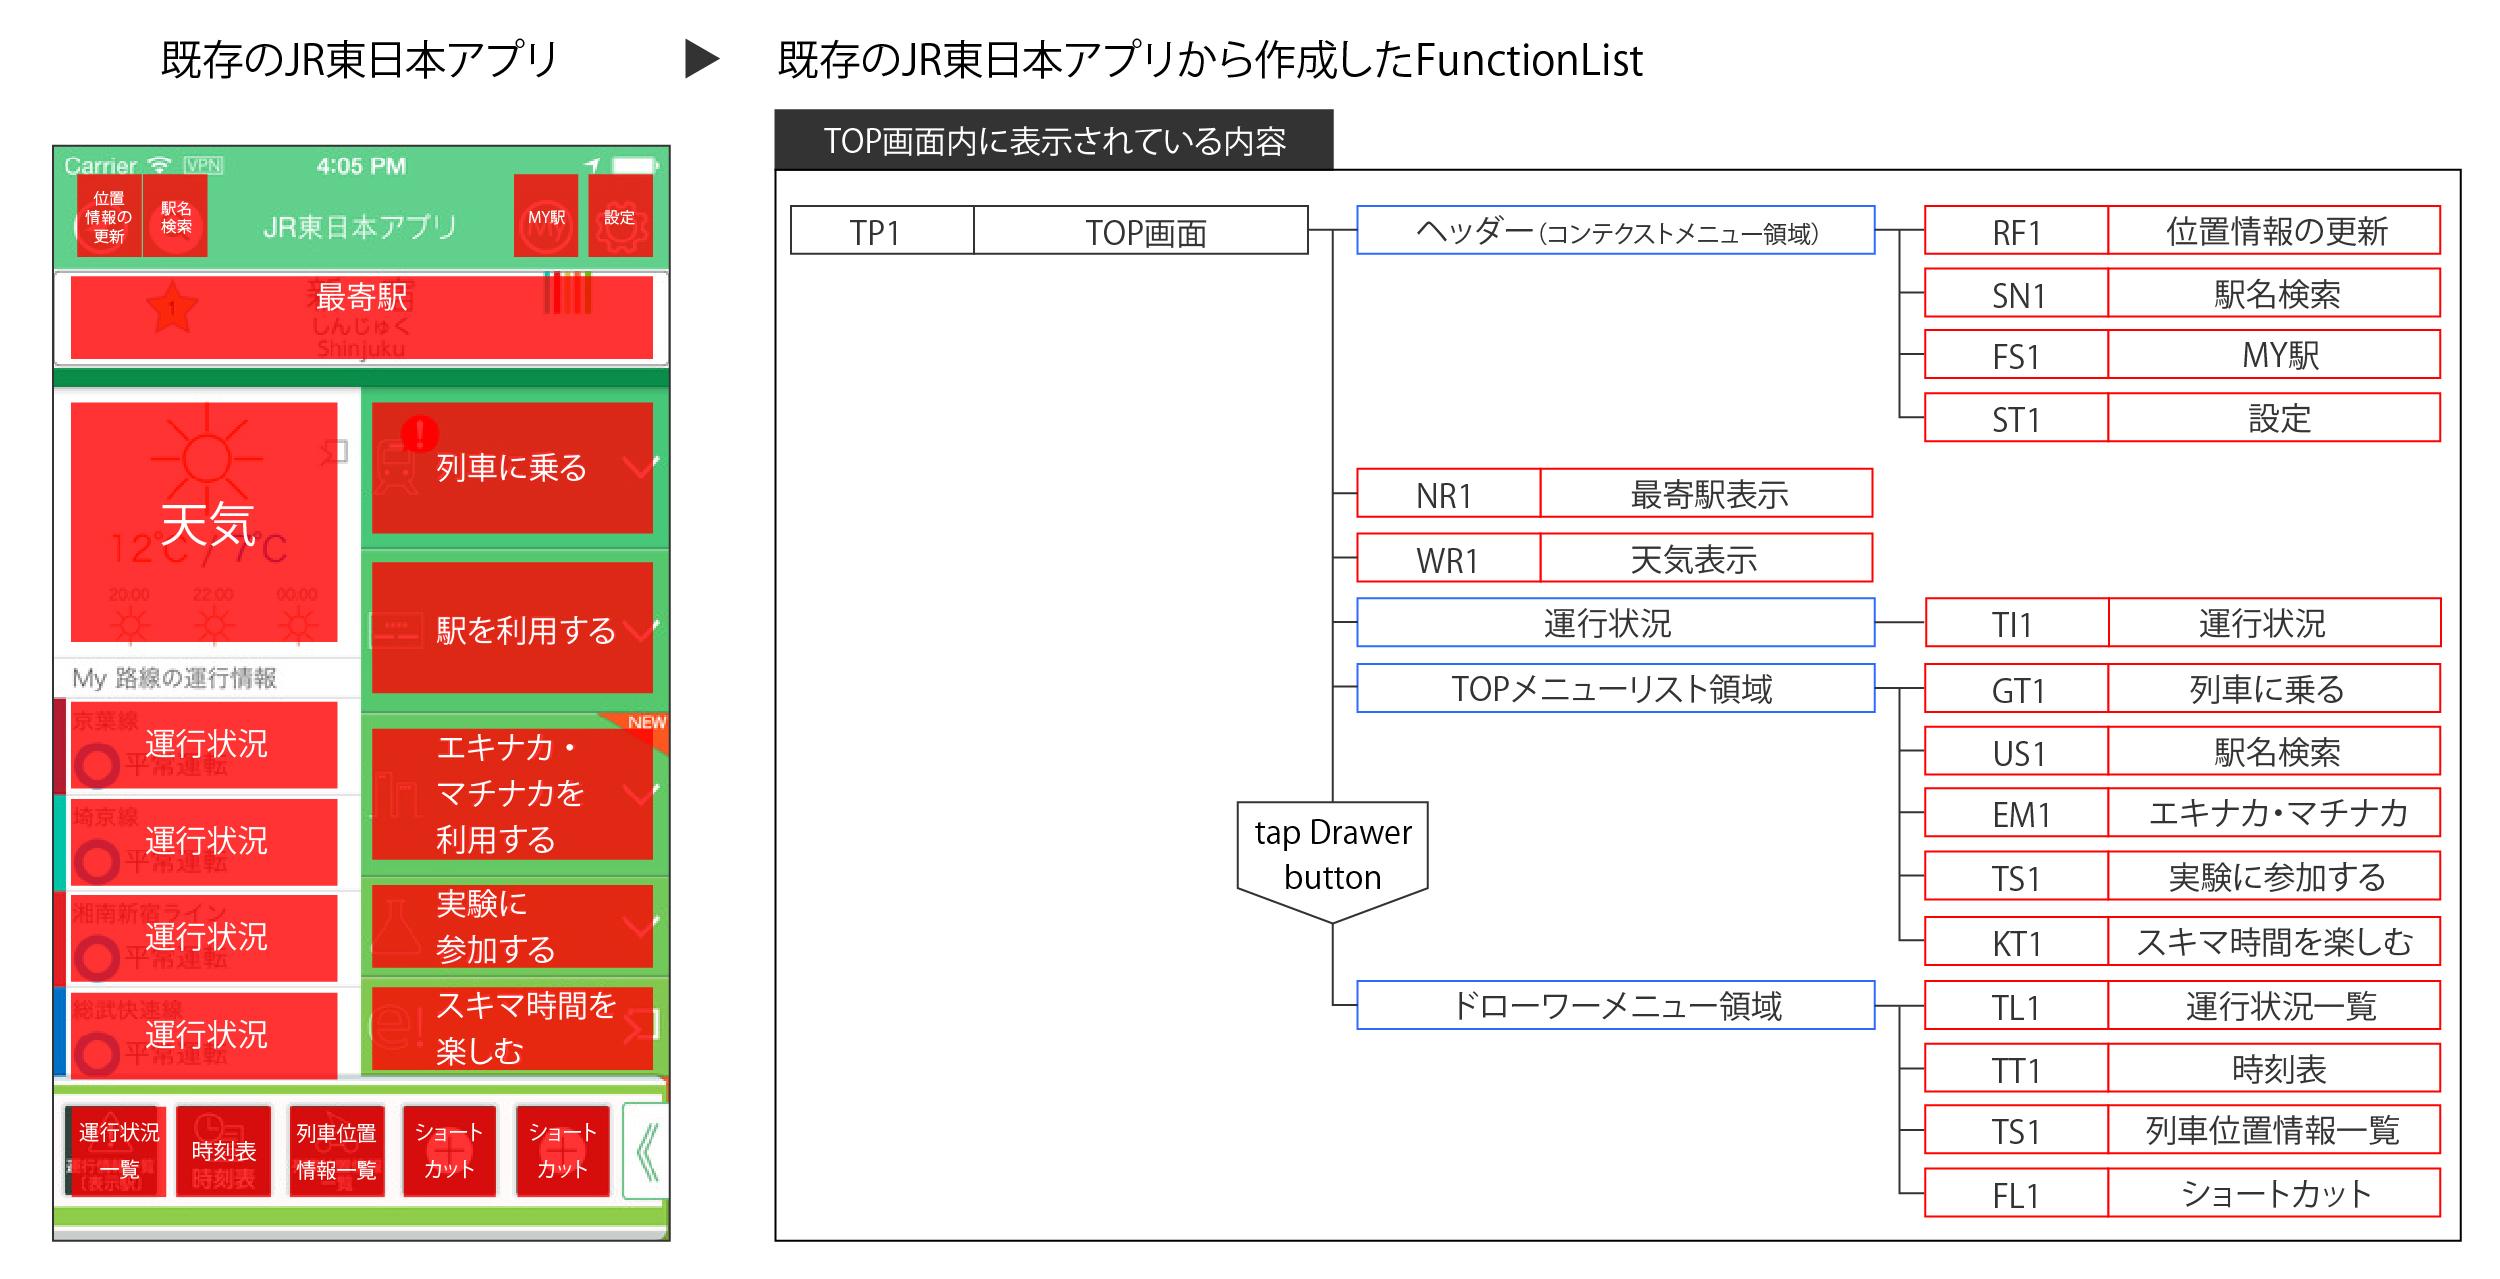 JR_function_list